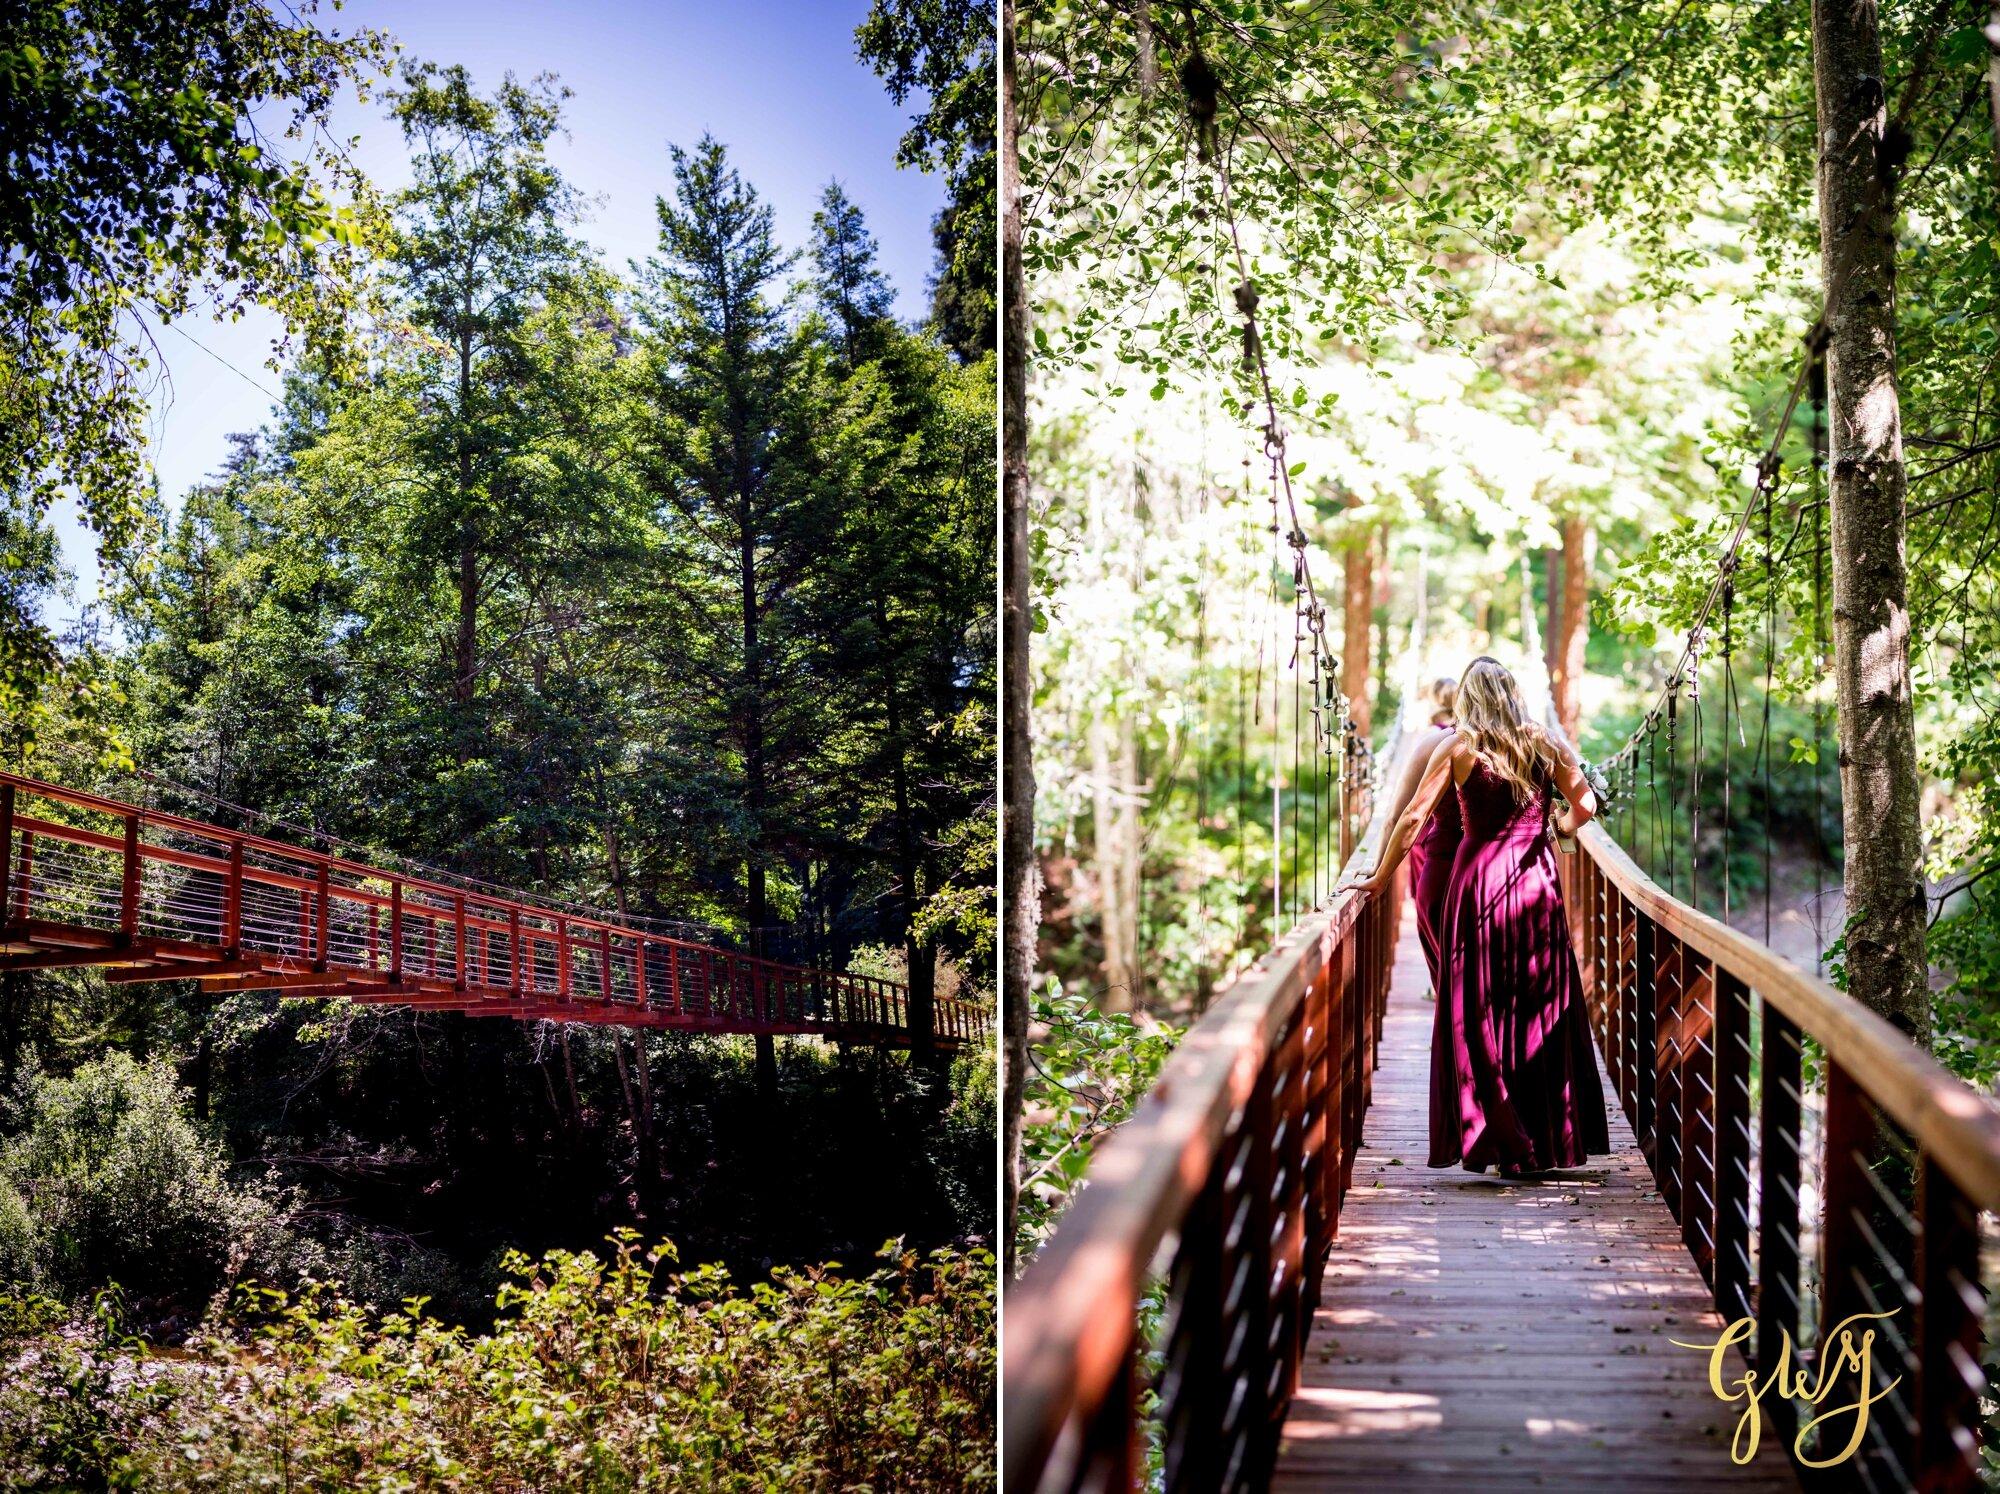 Casey + Jordan's Intimate Big Sur Elopement in the Redwoods by Glass Woods Media 21.jpg